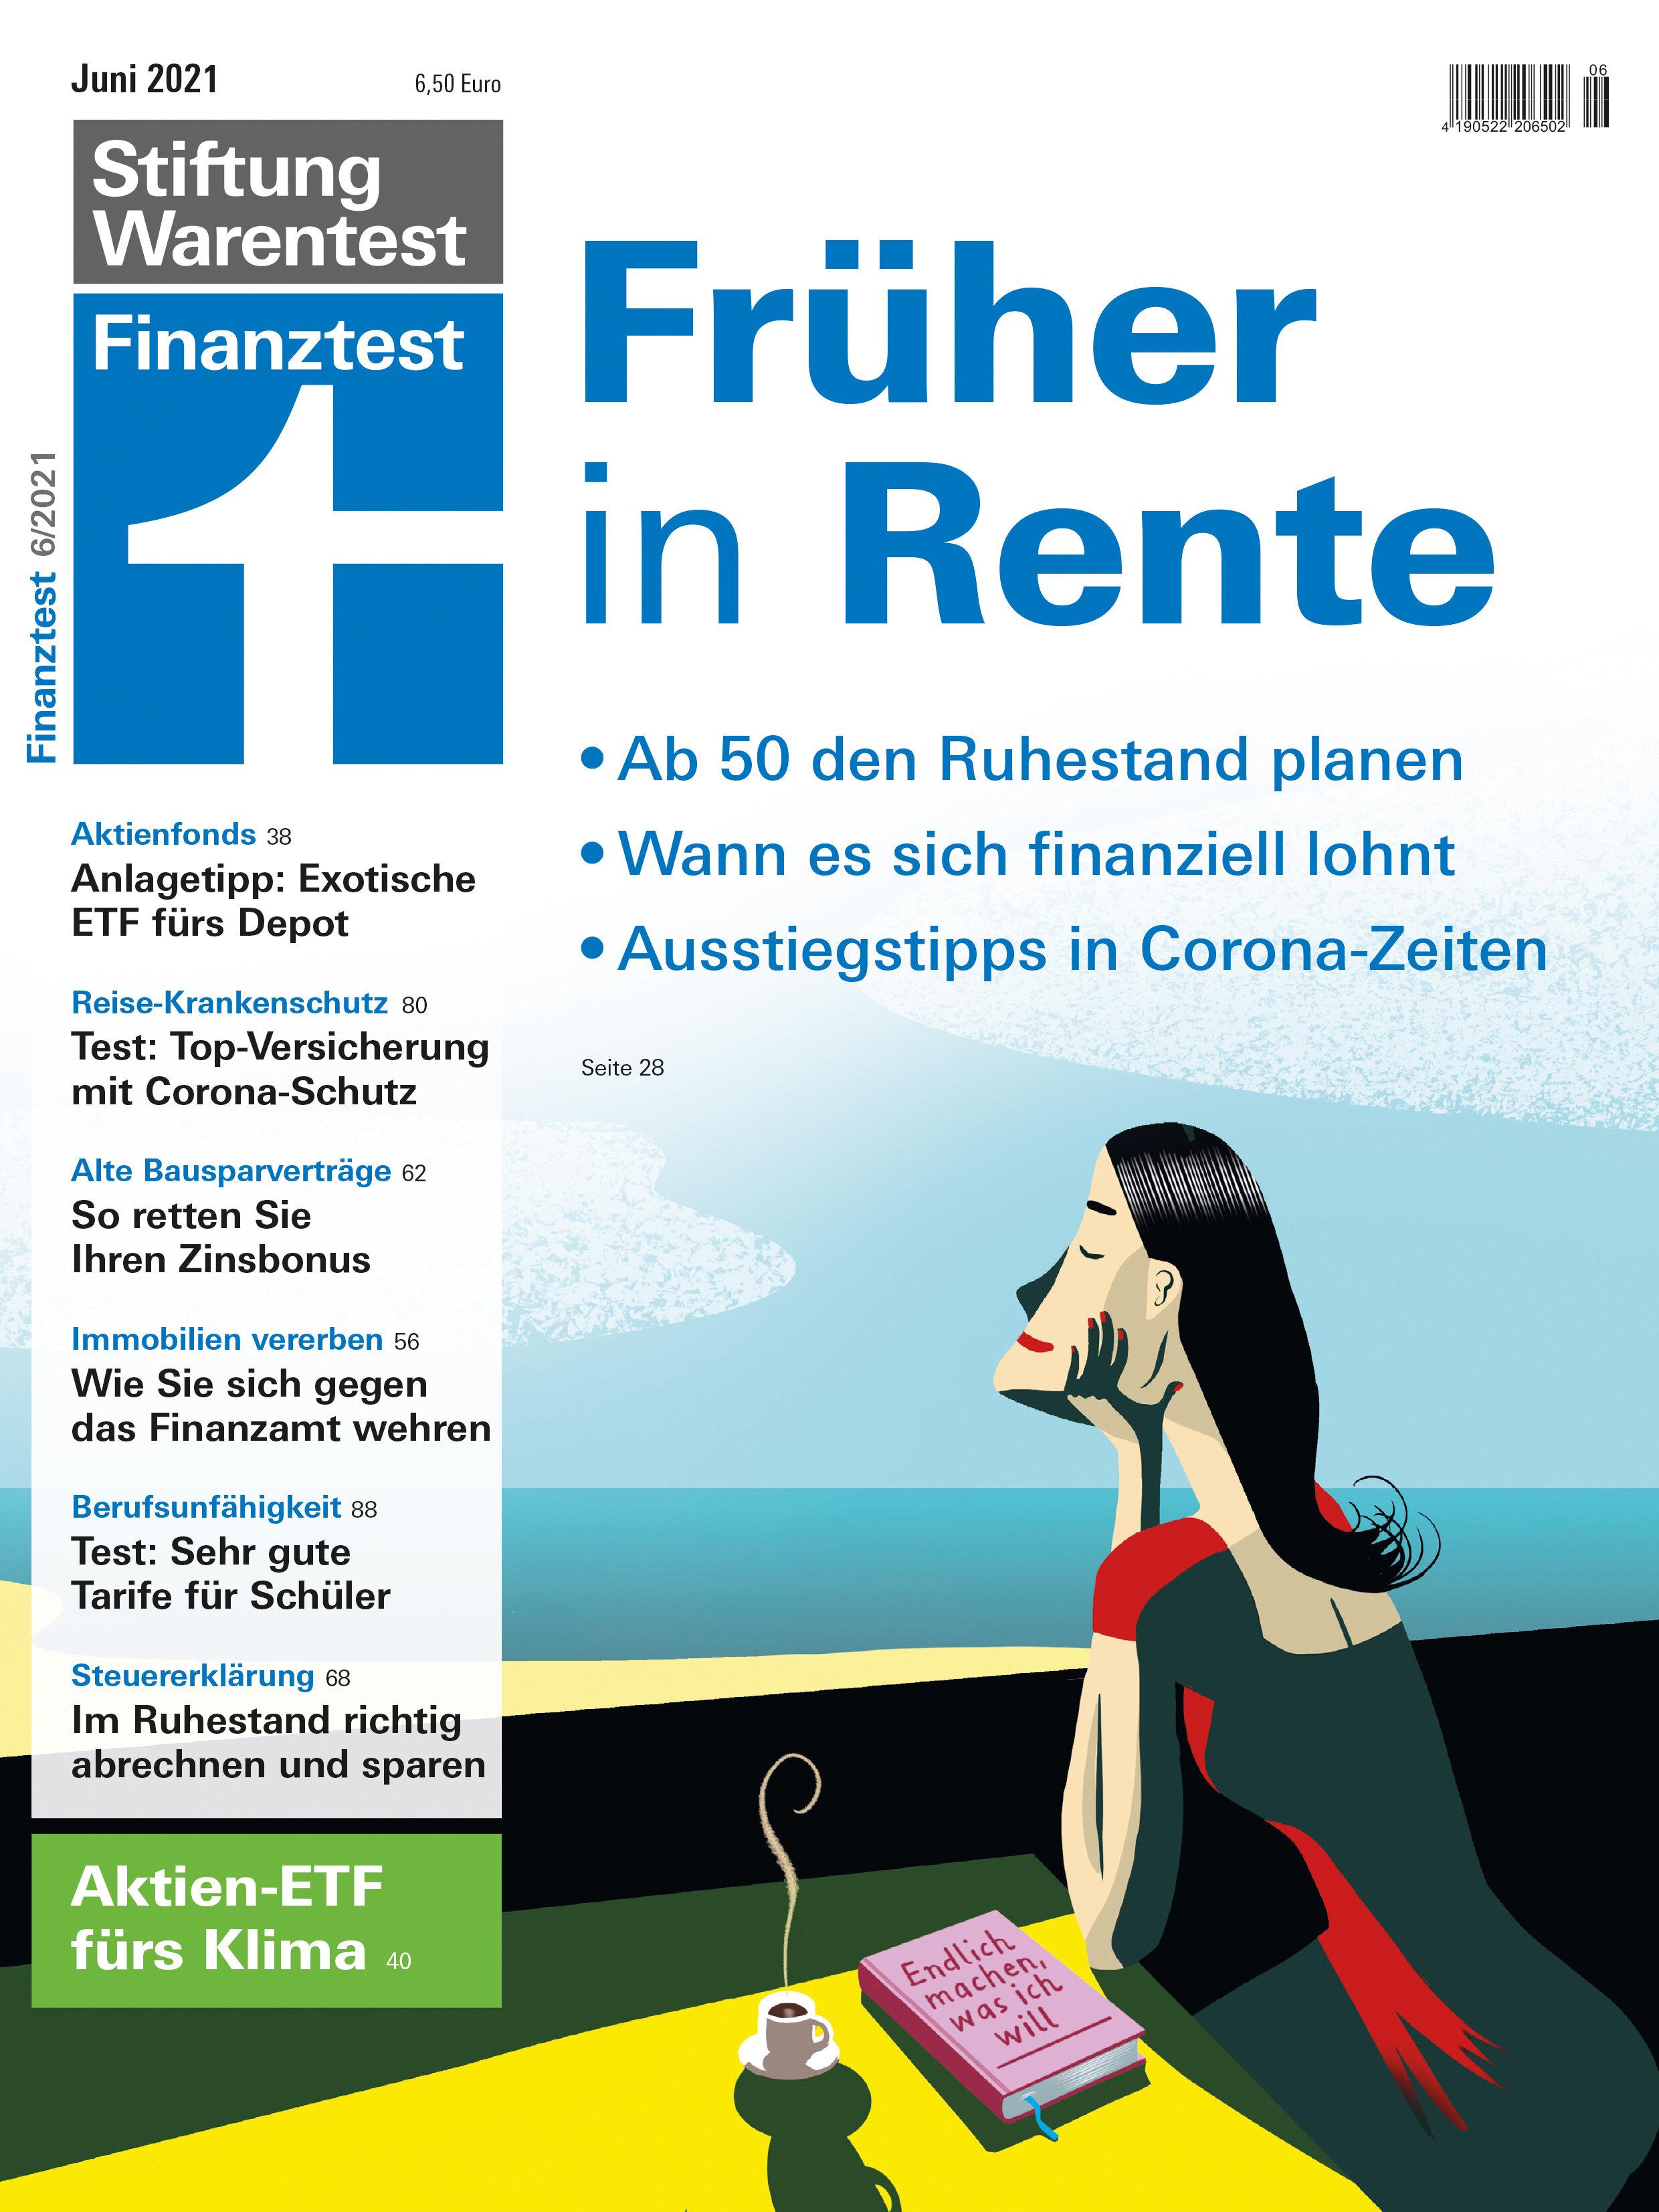 Finanztest Studentenabo